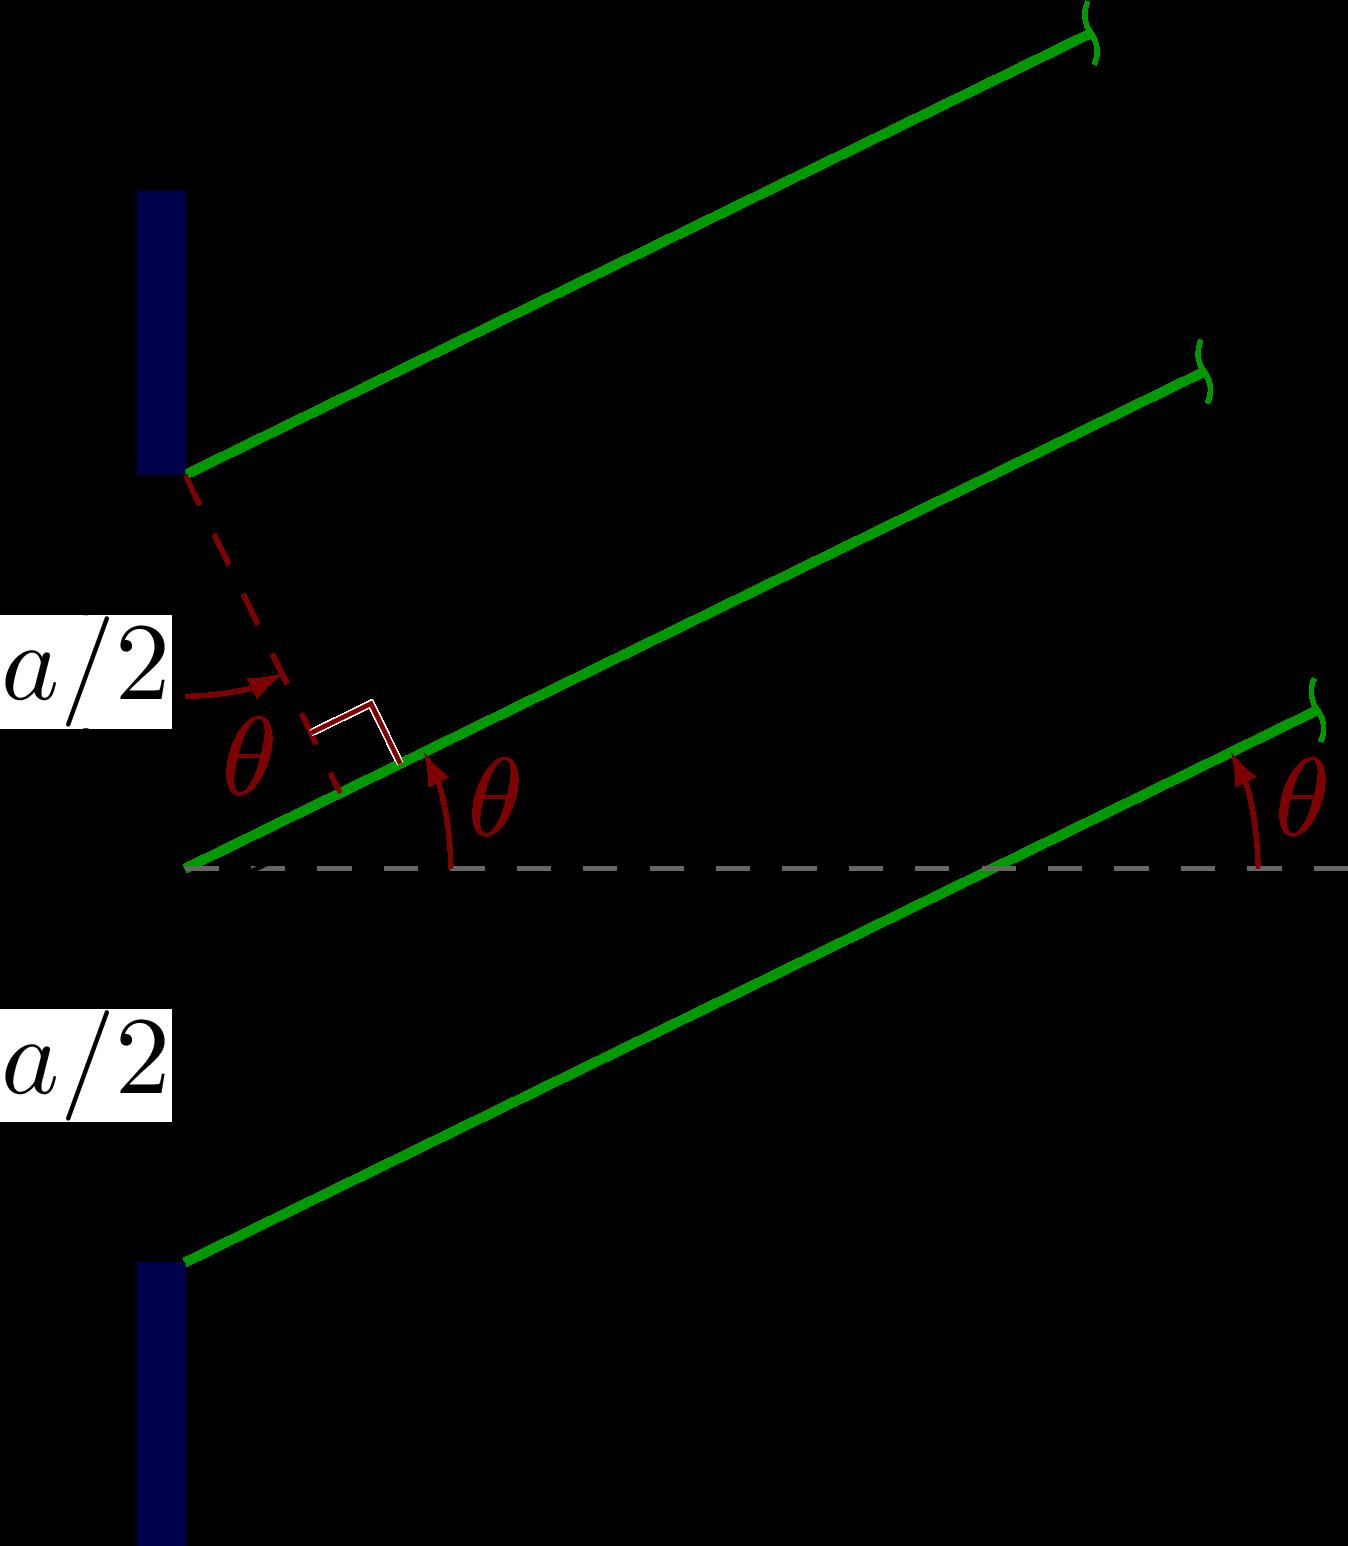 optics_diffraction-008.png